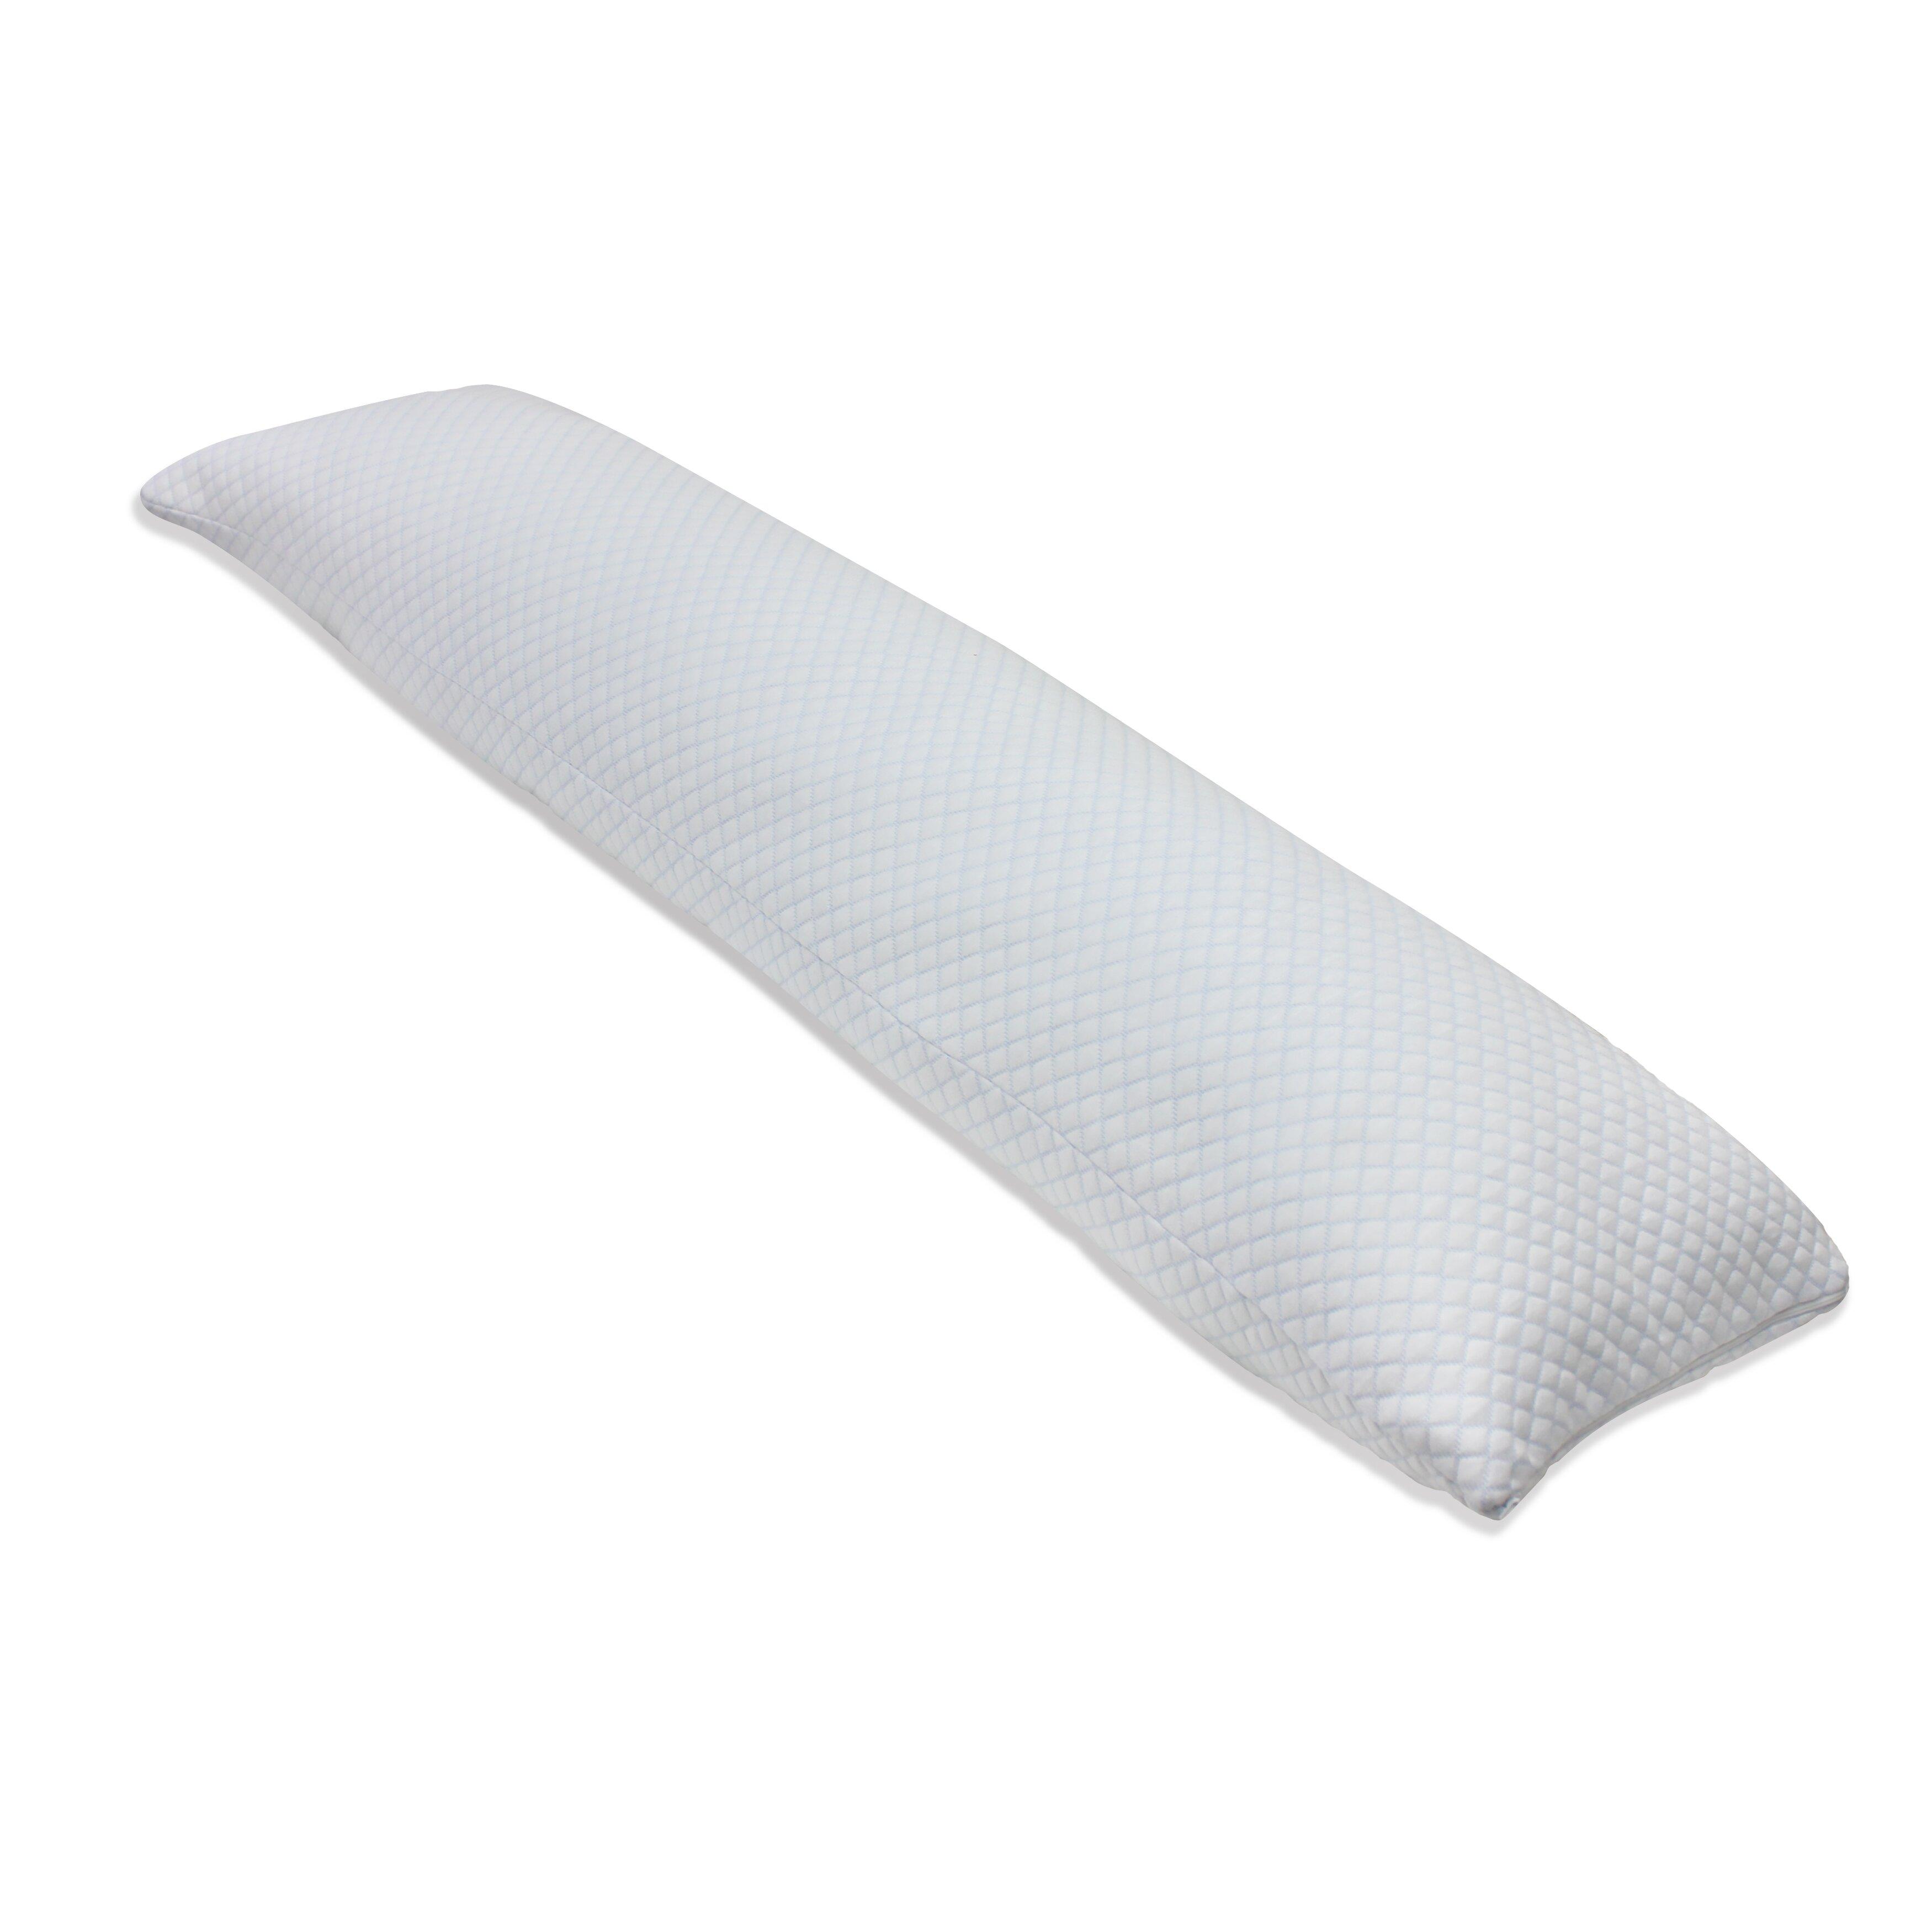 Tempure Rest Cool Gel Memory Foam Body Pillow Amp Reviews